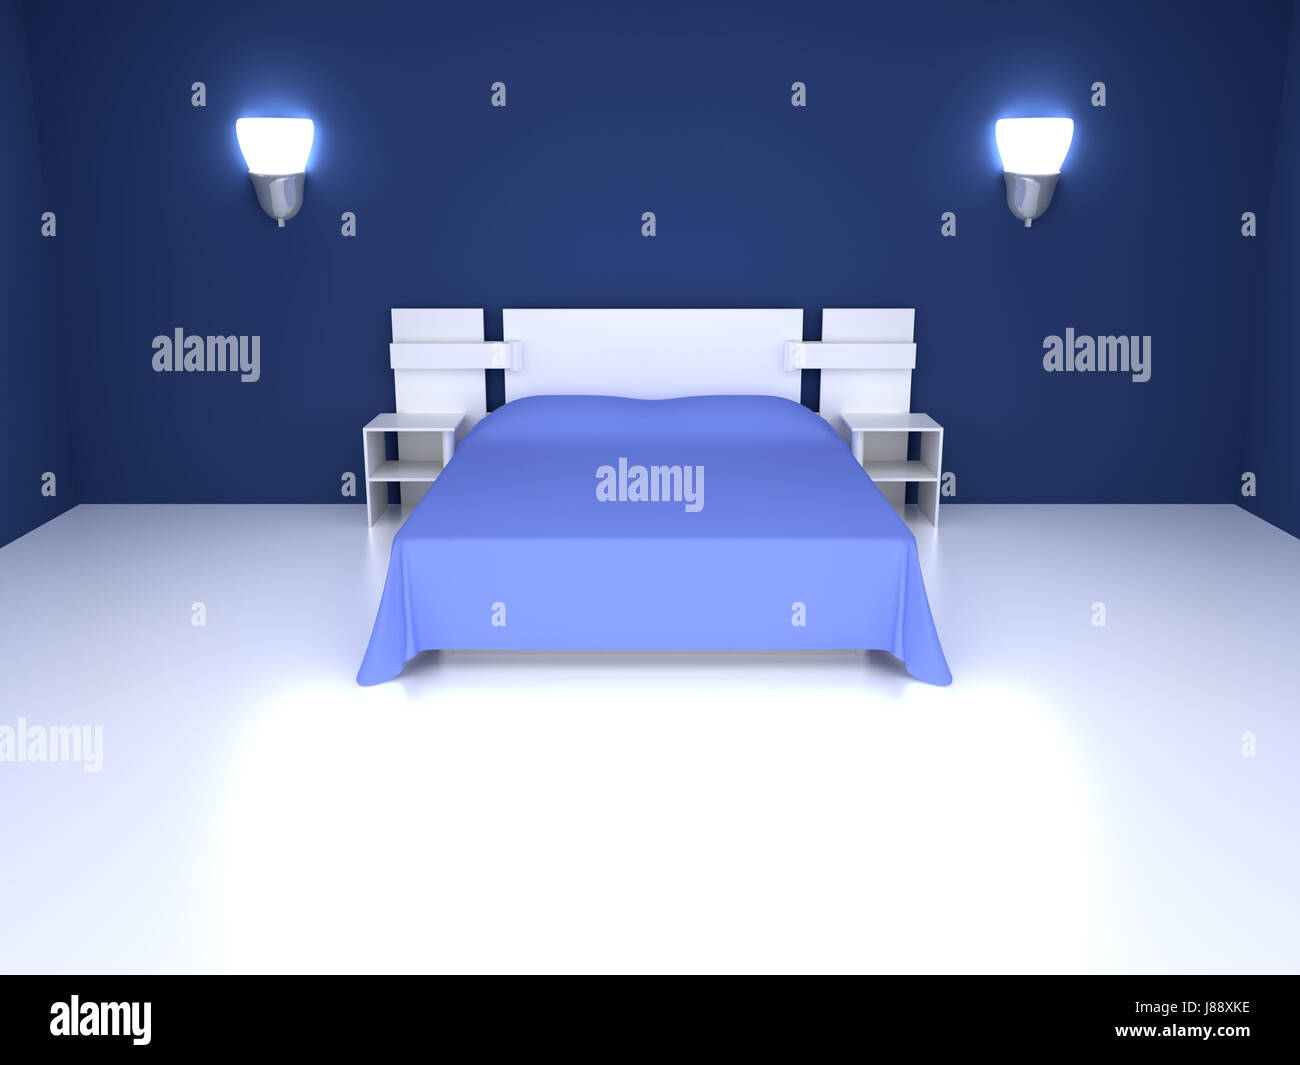 Bedside Locker Stockfotos & Bedside Locker Bilder - Alamy